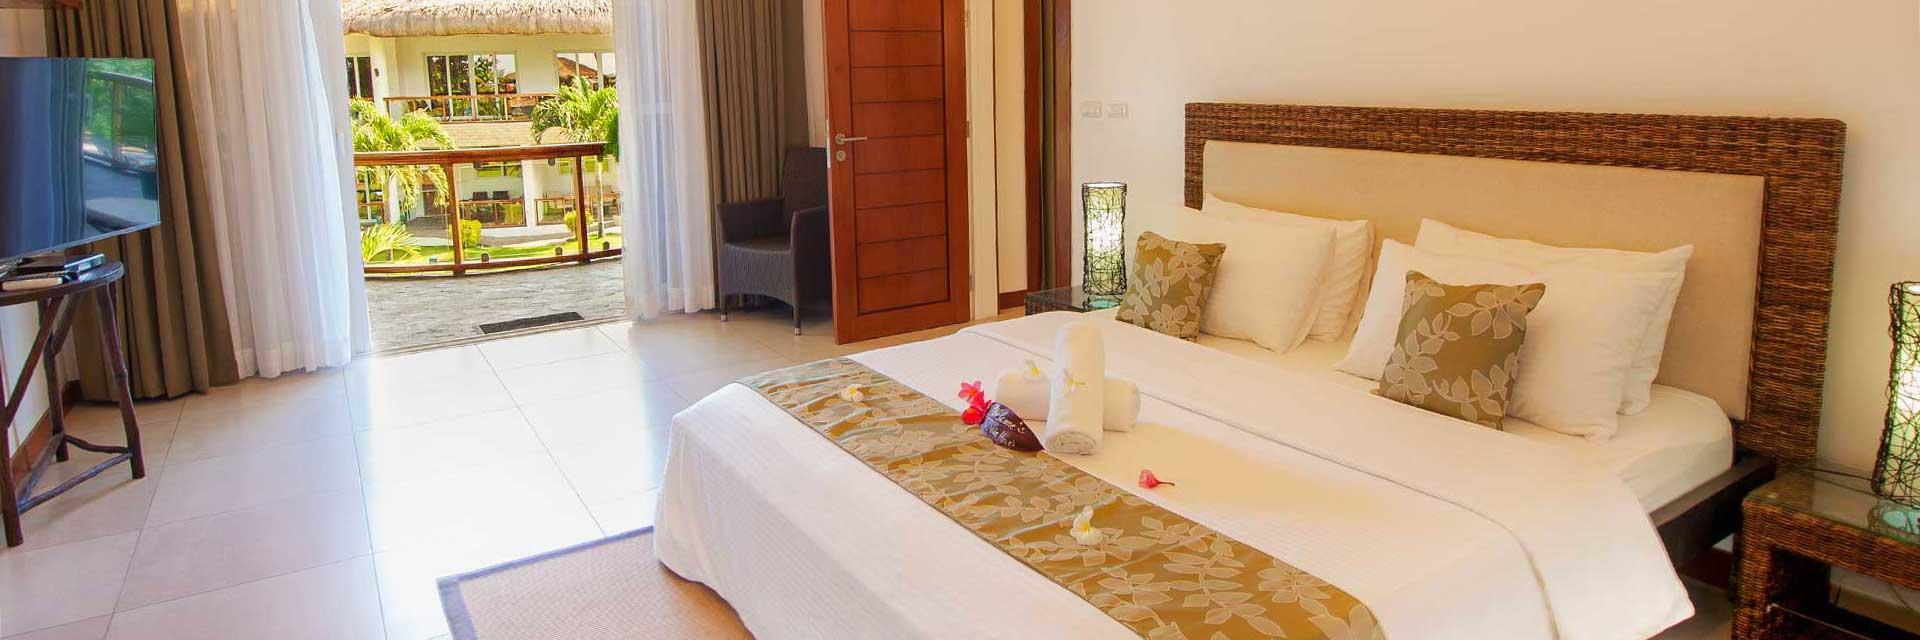 Vida Homes - Bedroom - Pool View - Bedroom